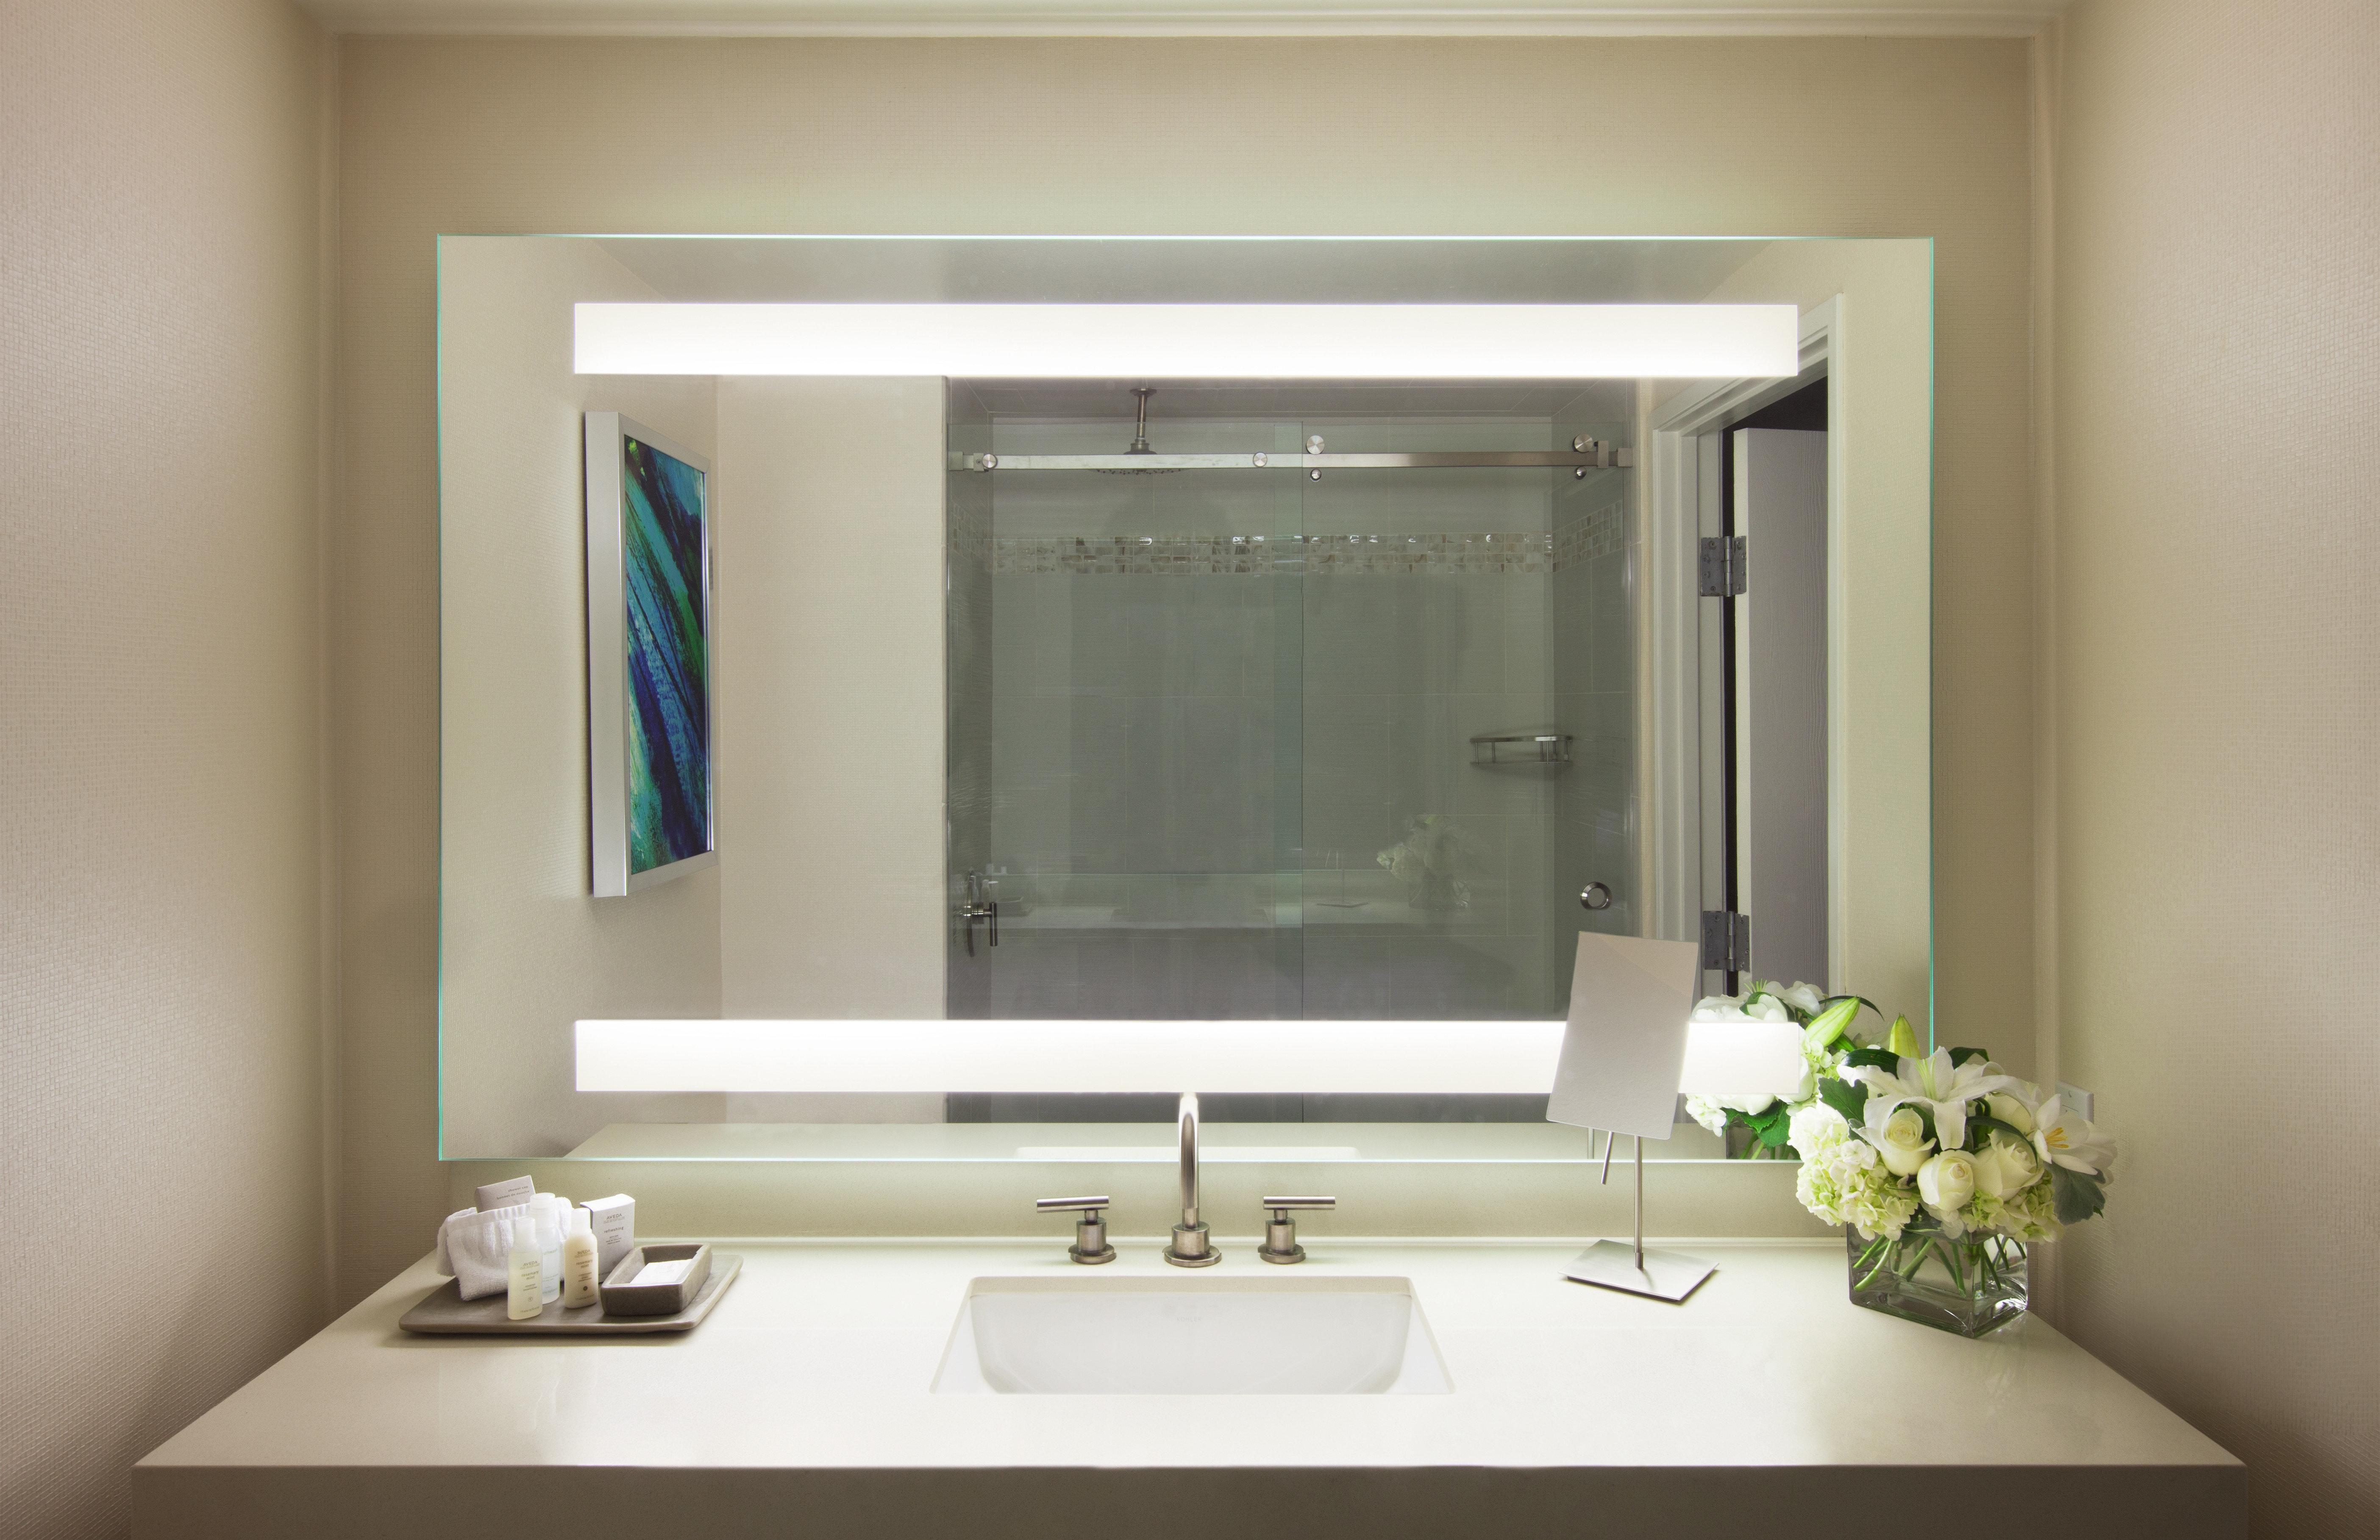 Bath Classic bathroom mirror sink living room home plumbing fixture bathroom cabinet bathtub toilet